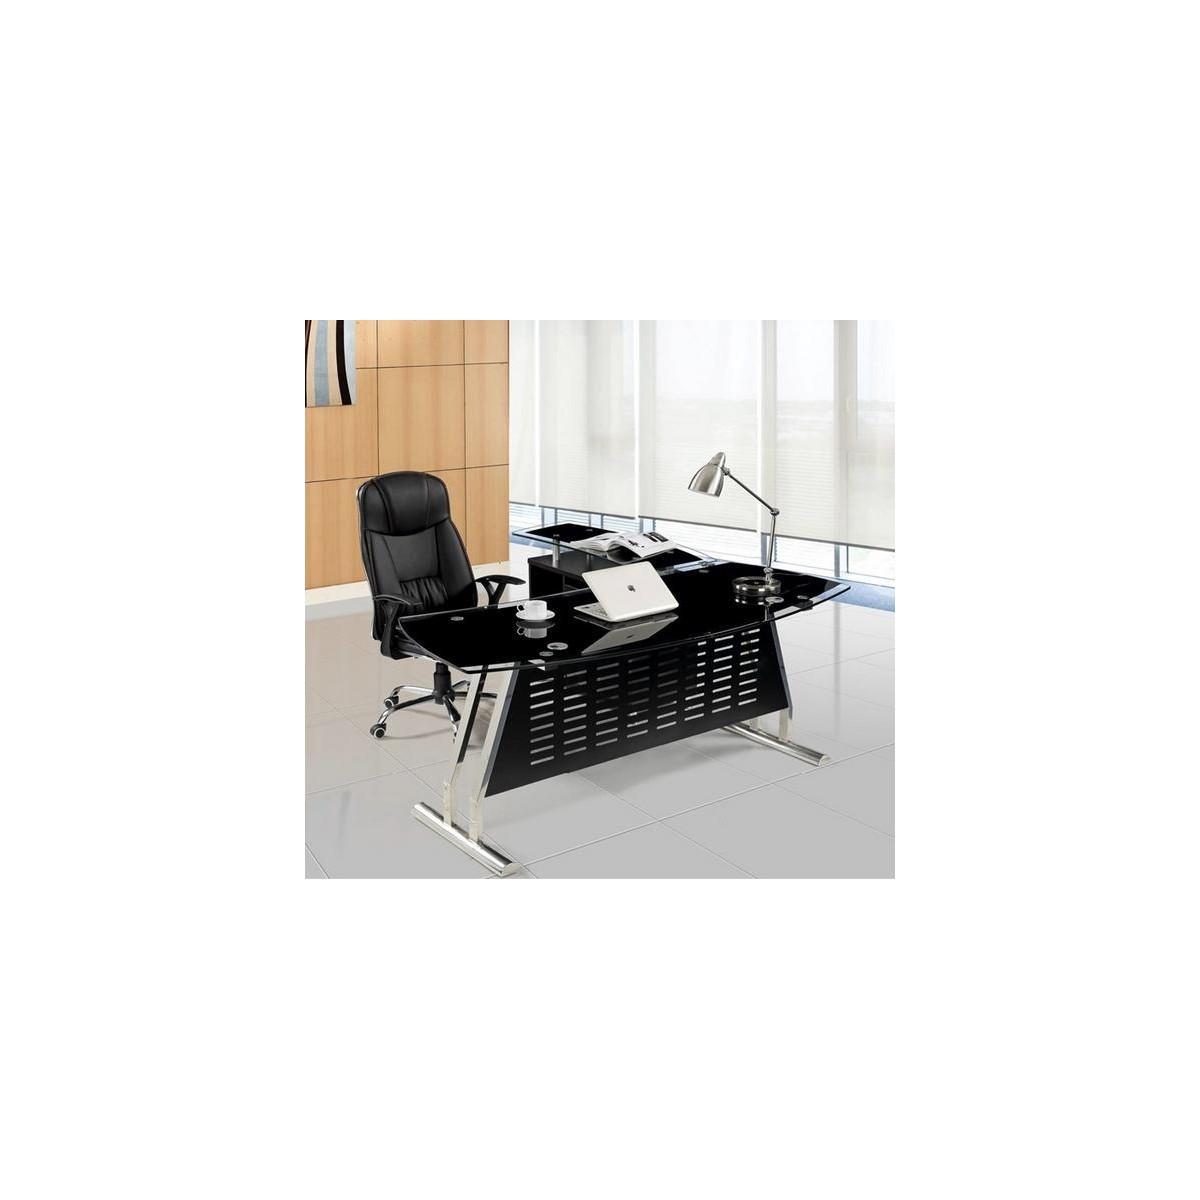 Mesa oficina cristal negra izquierda 160x80 cms de SDM - EVIAN-I160